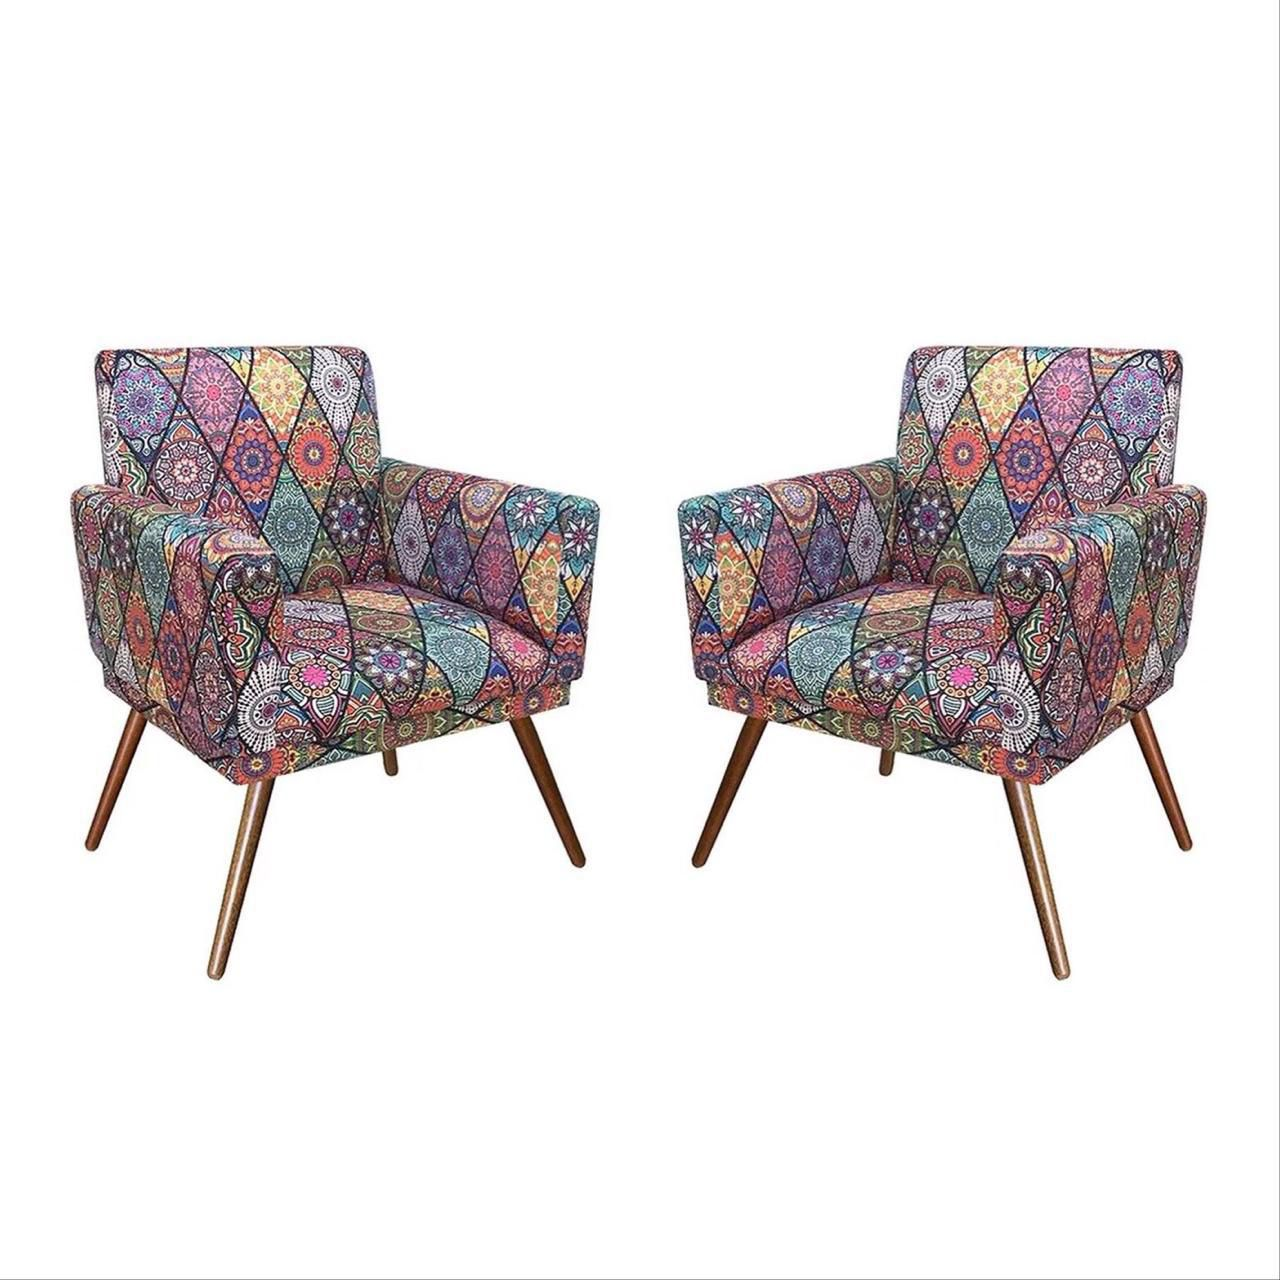 Kit 02 Poltrona Decorativa Nina com rodapé Mosaico - Bela Casa Shop